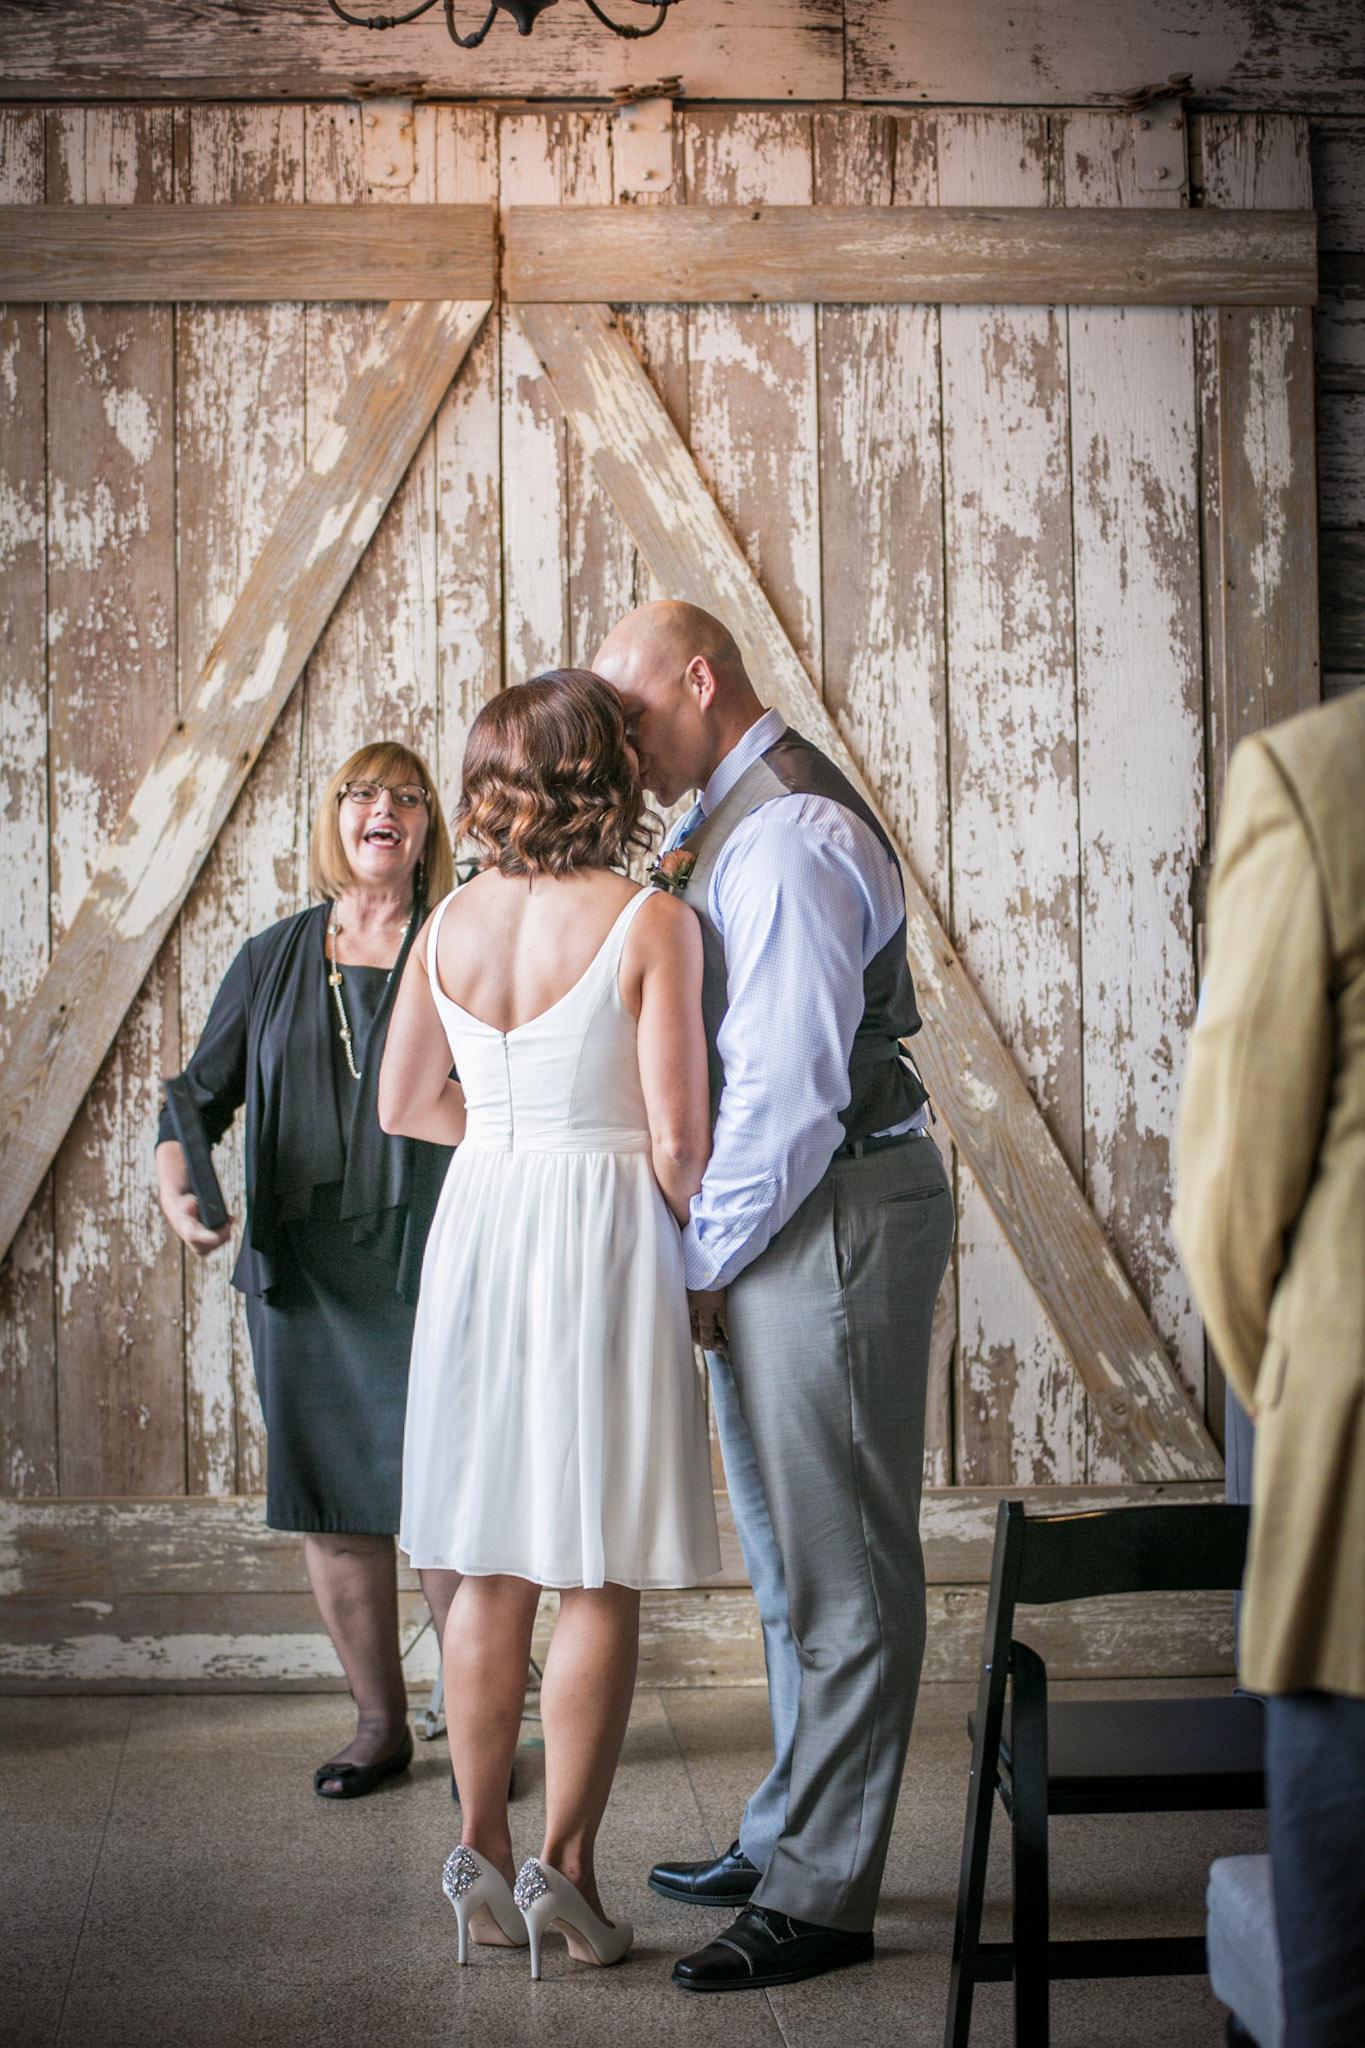 The_Vow_Exchange_Kansas_City_Small_Budget_Wedding_Venue_Lisa & John_043.jpg